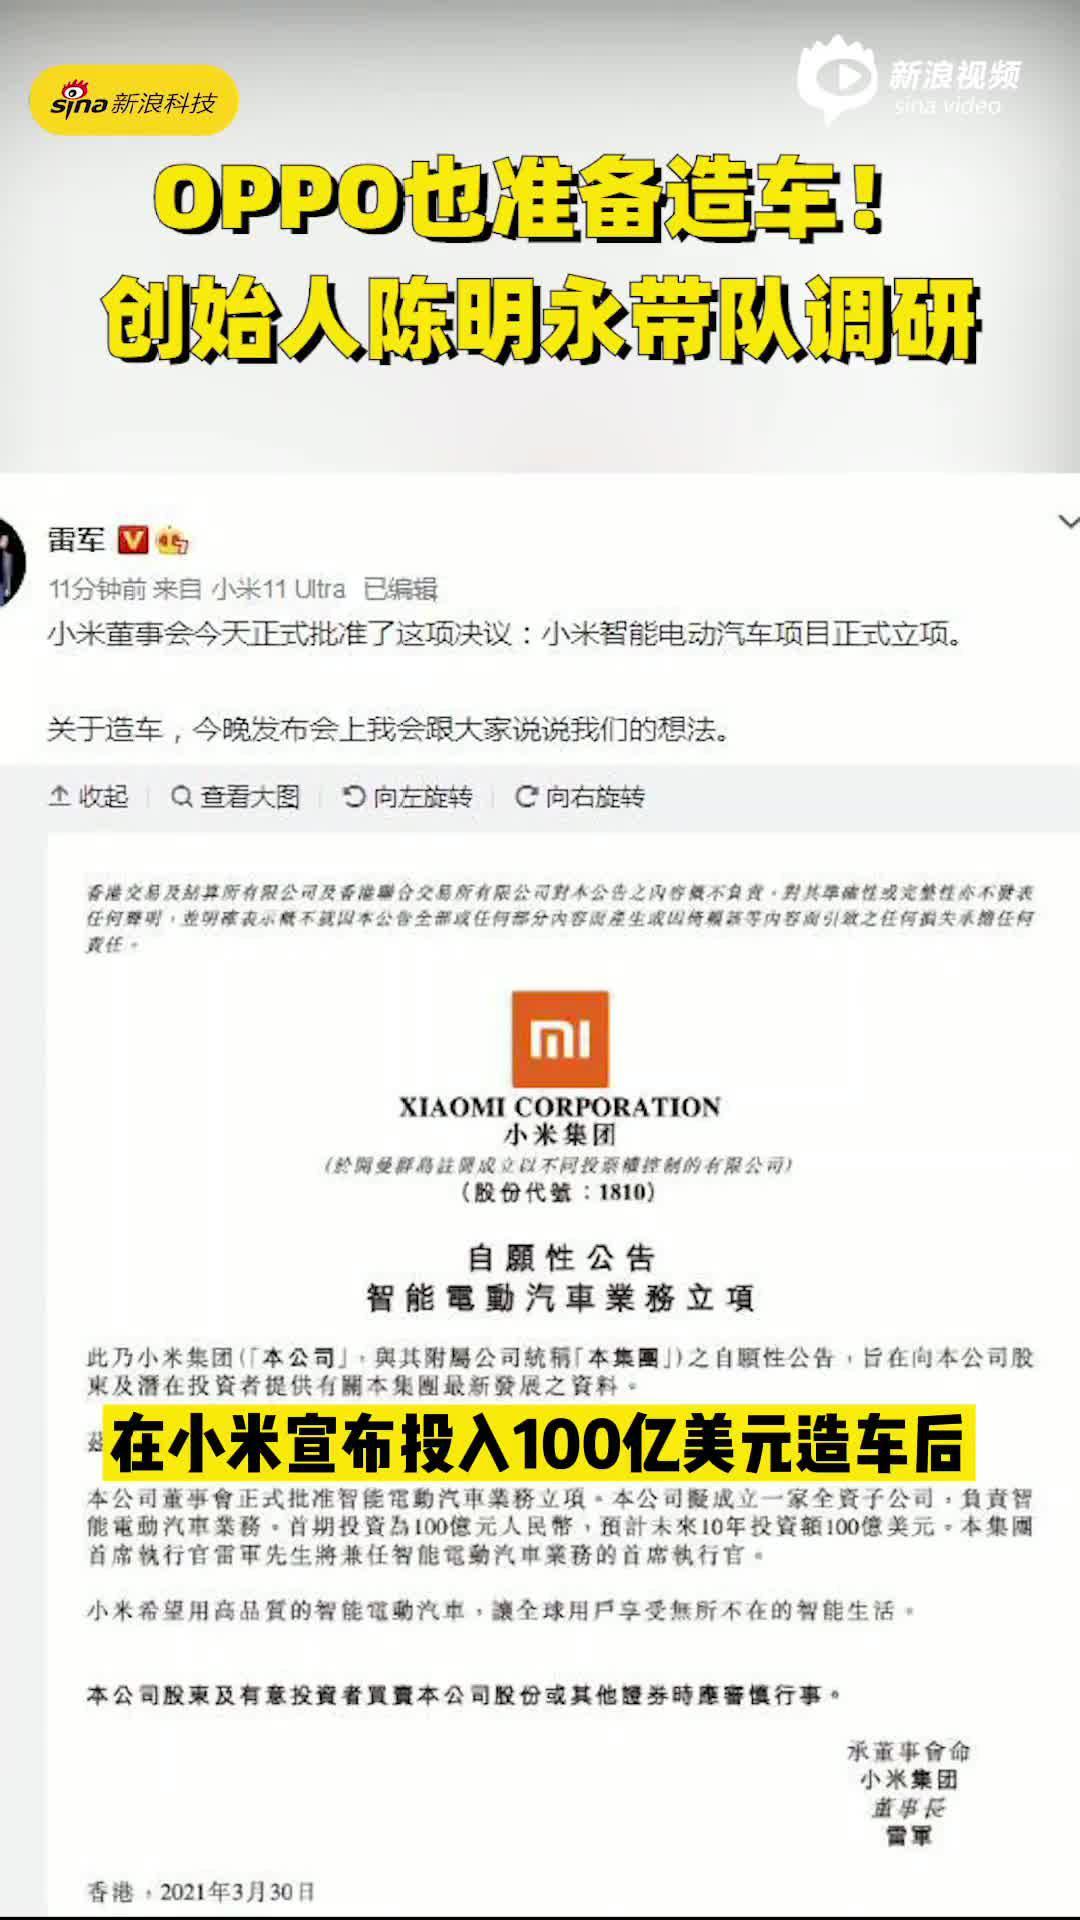 OPPO筹备造车,创始人陈明永带队调研